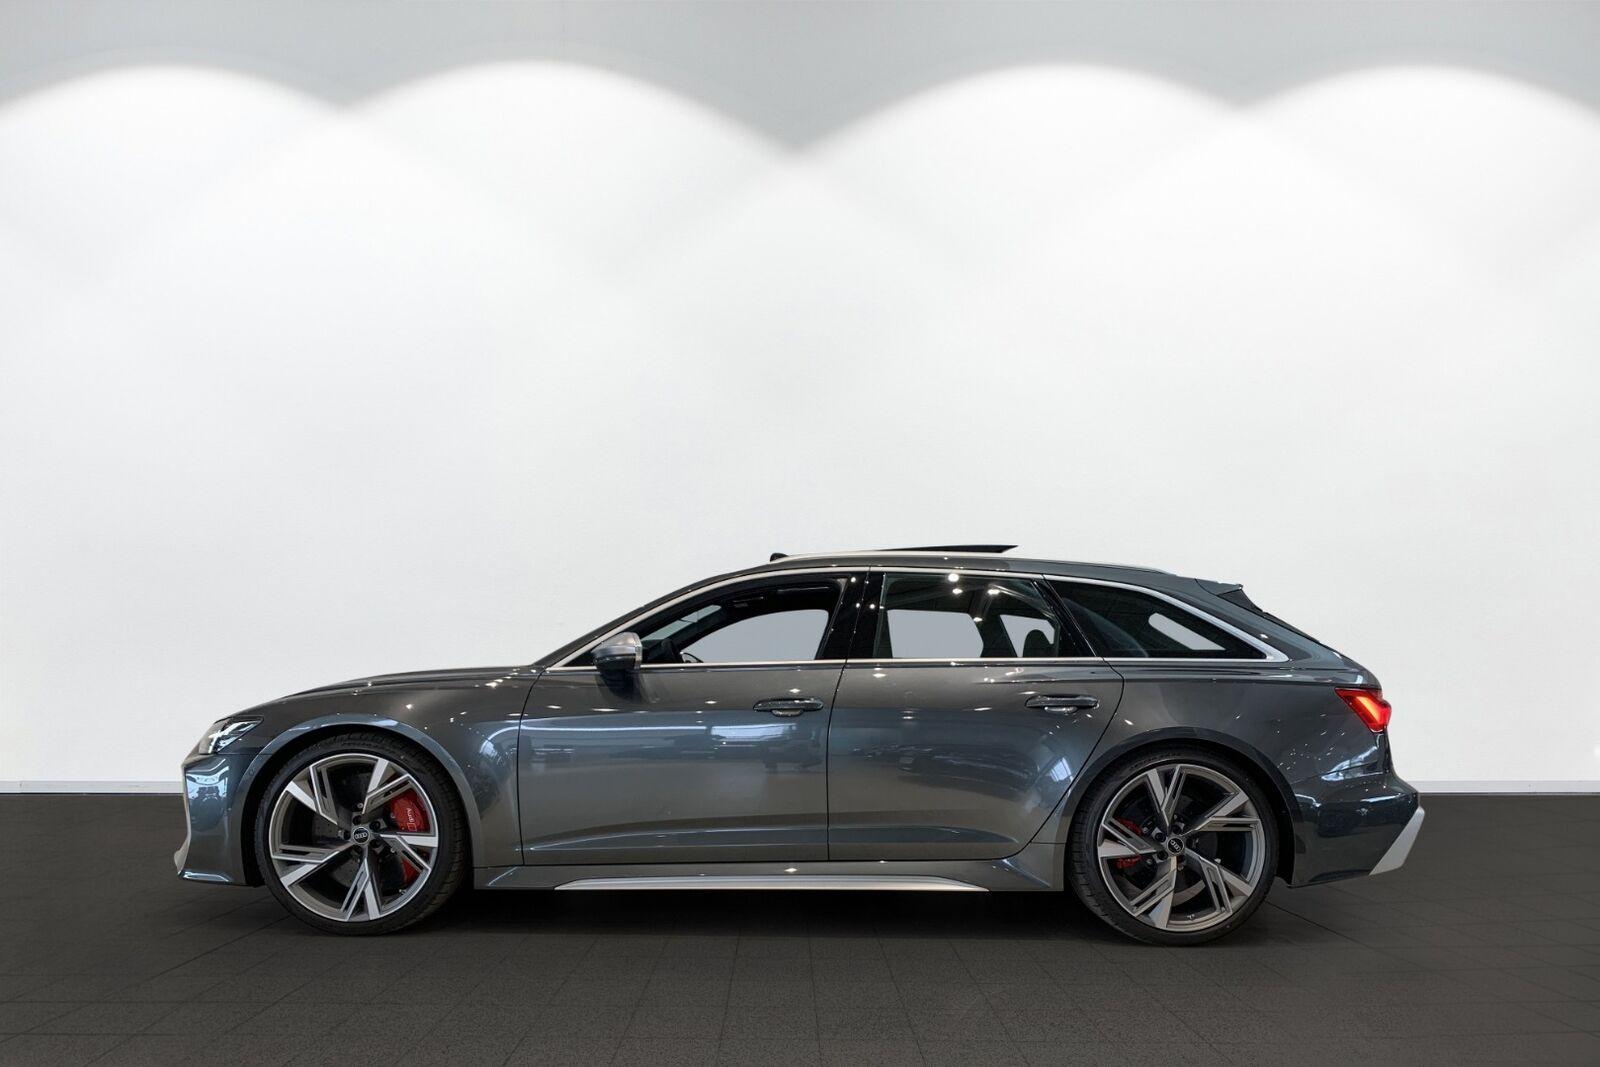 Brugt Audi RS6 4,0 TFSi Avant quattro Tiptr. til salg ...